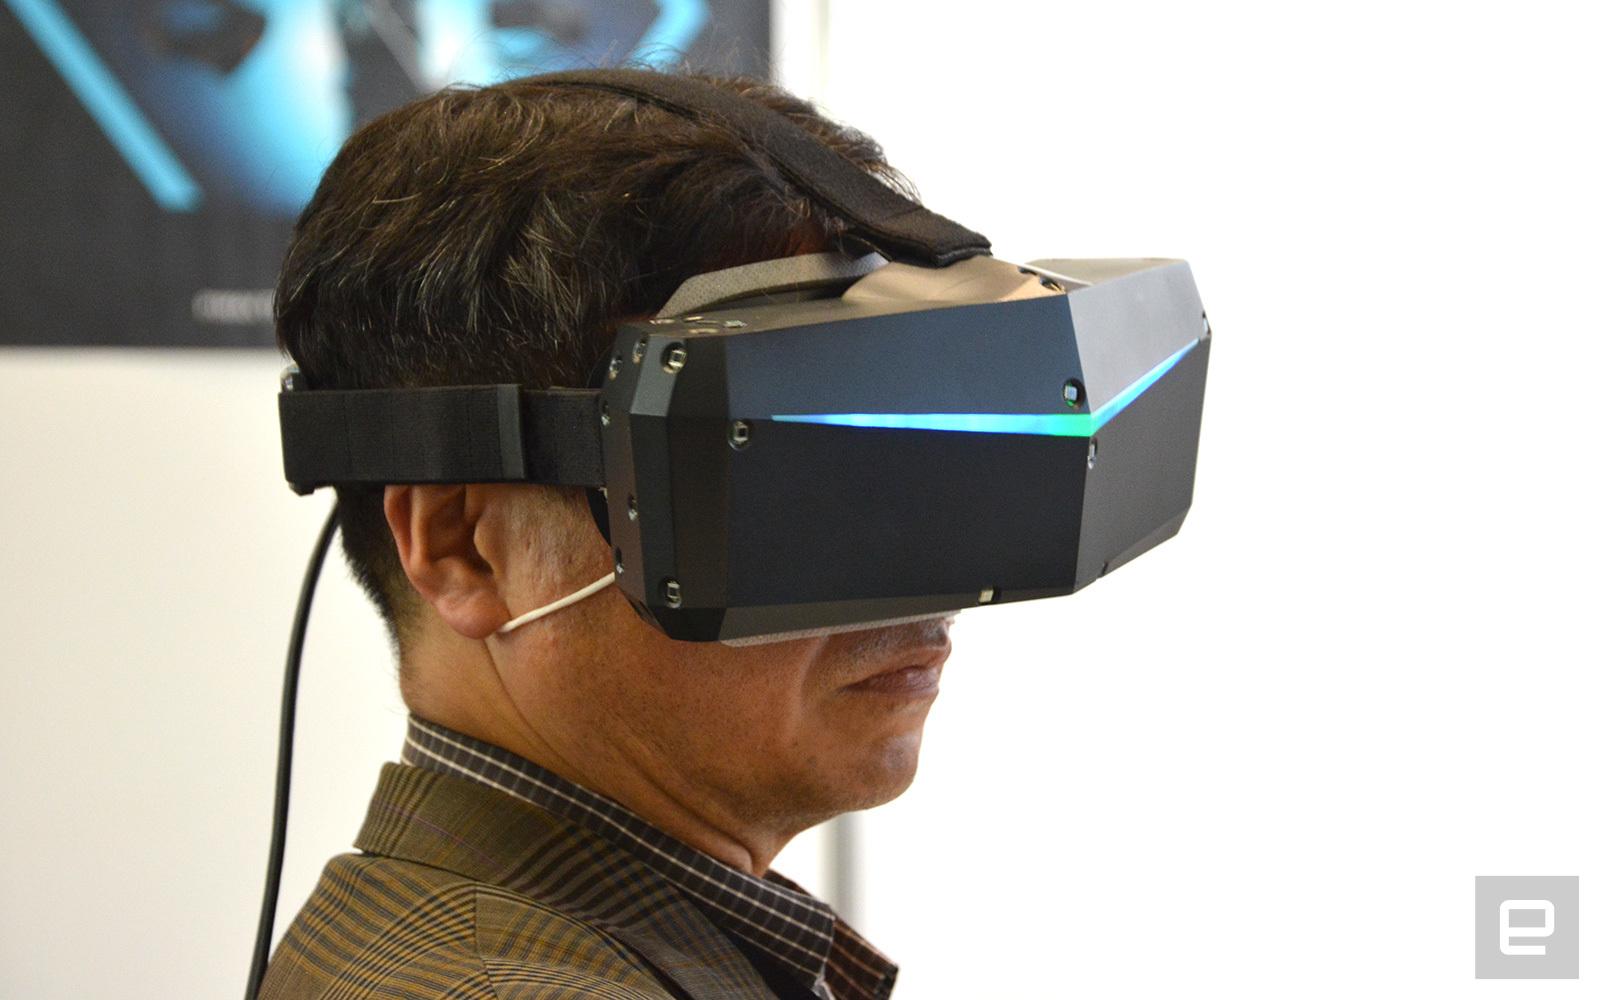 78df8200f ... spustil kickstarter Pimax predstavil 8K VR headset, spustil kickstarter